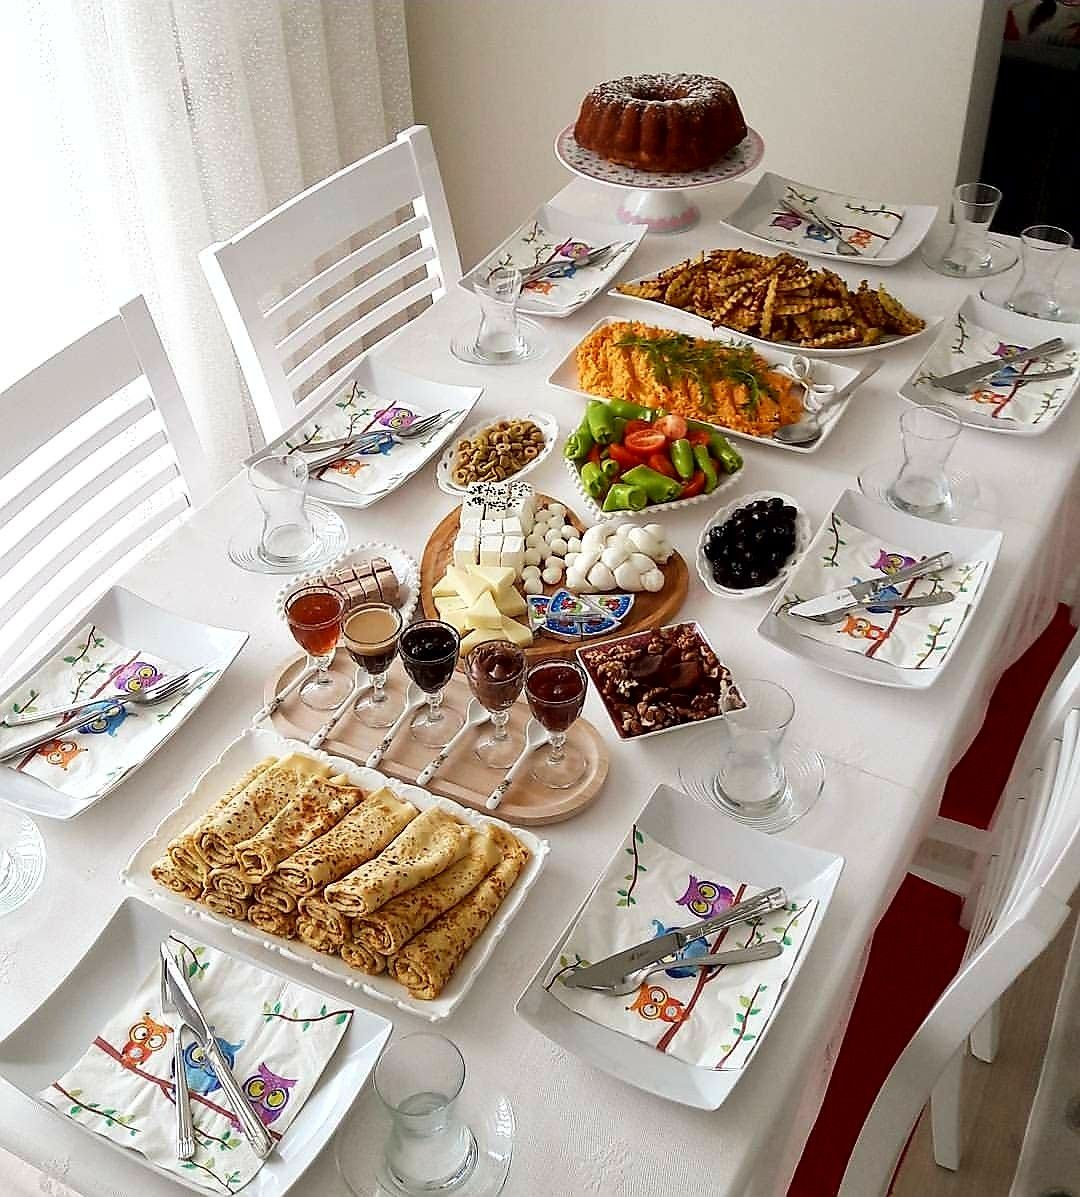 Epingle Par Hana Sur Cuisine Turque Cuisine Turque Cuisine